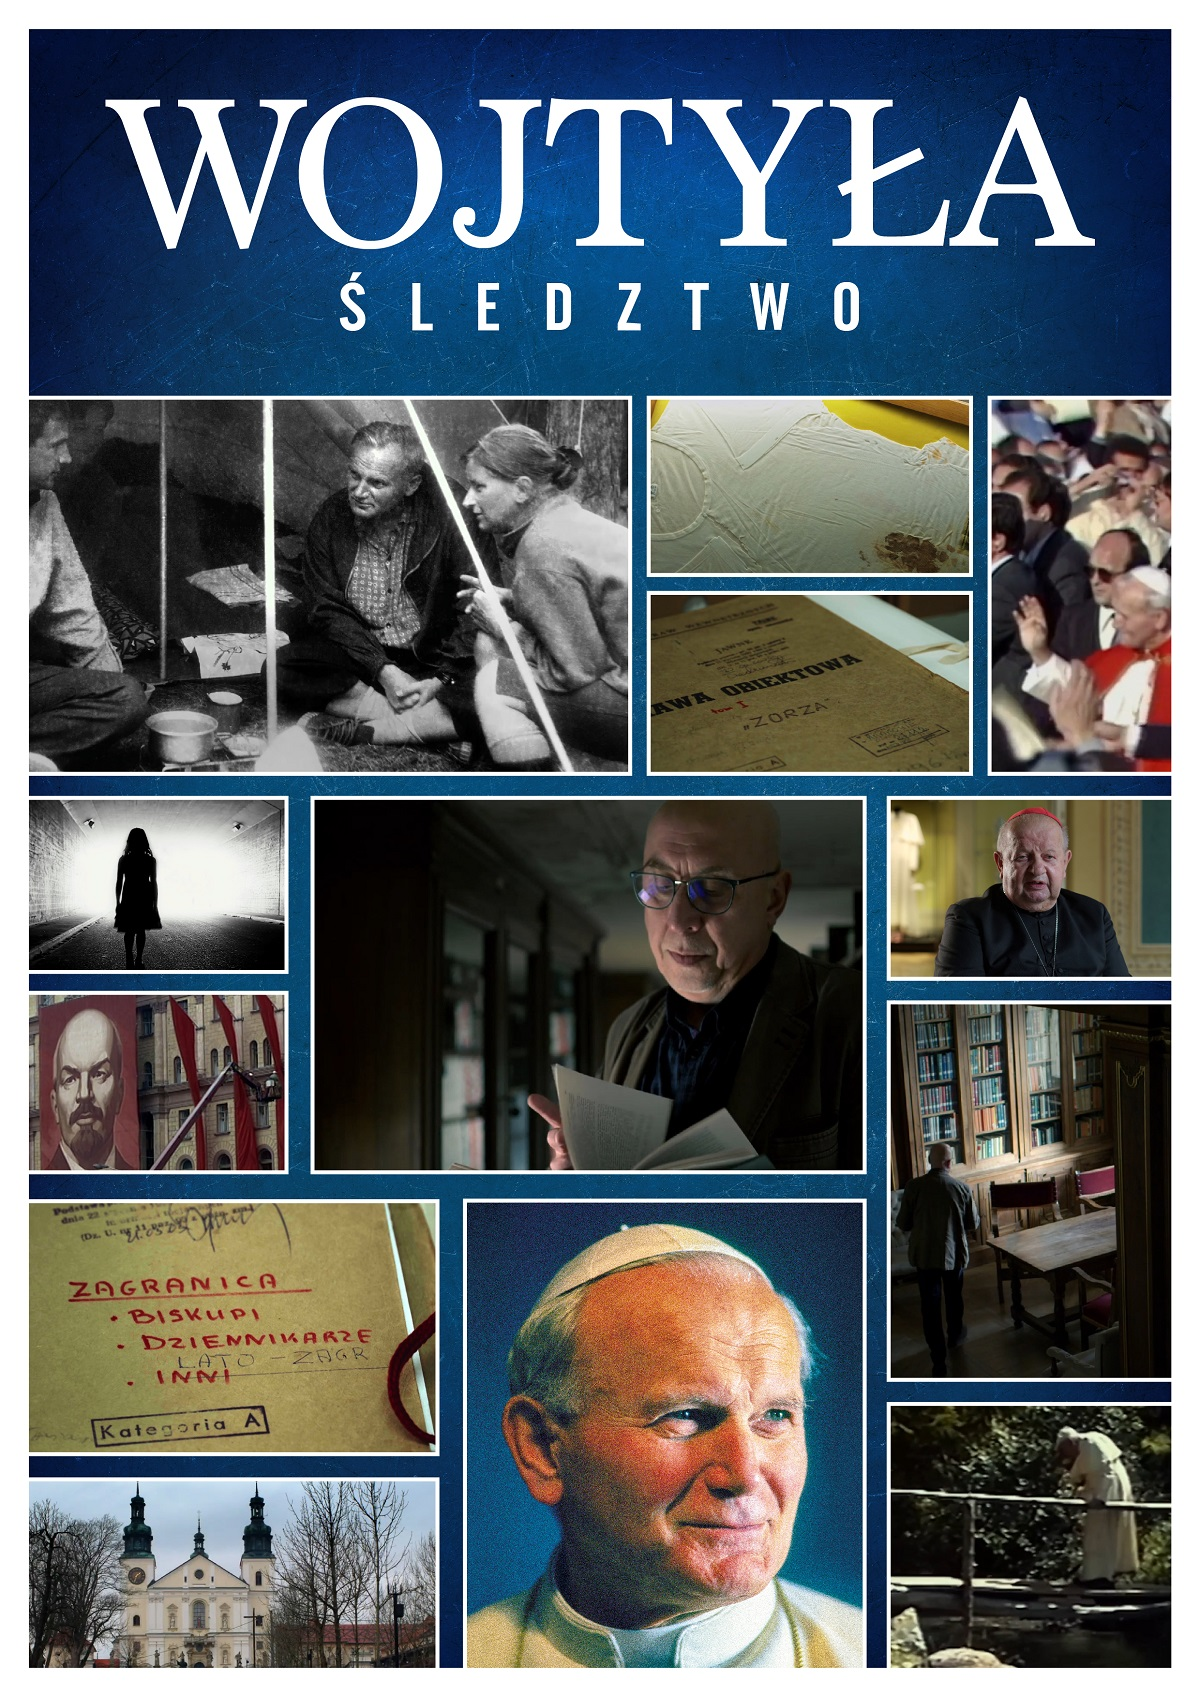 wojtyla_sledztwo_screen